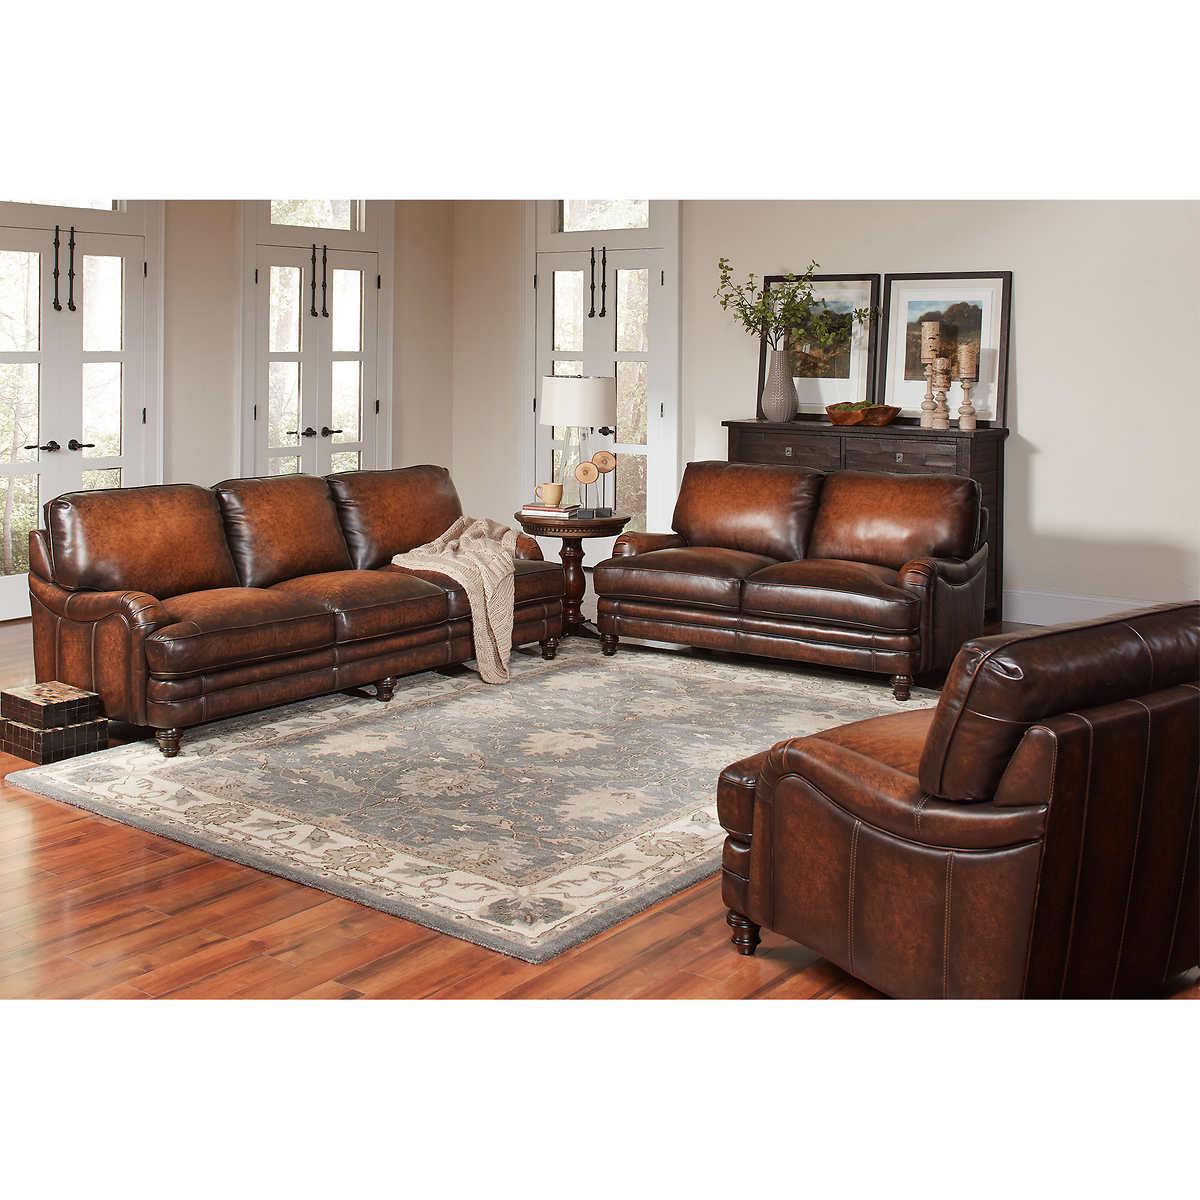 Langston 3 Piece Top Grain Leather Living Room Set